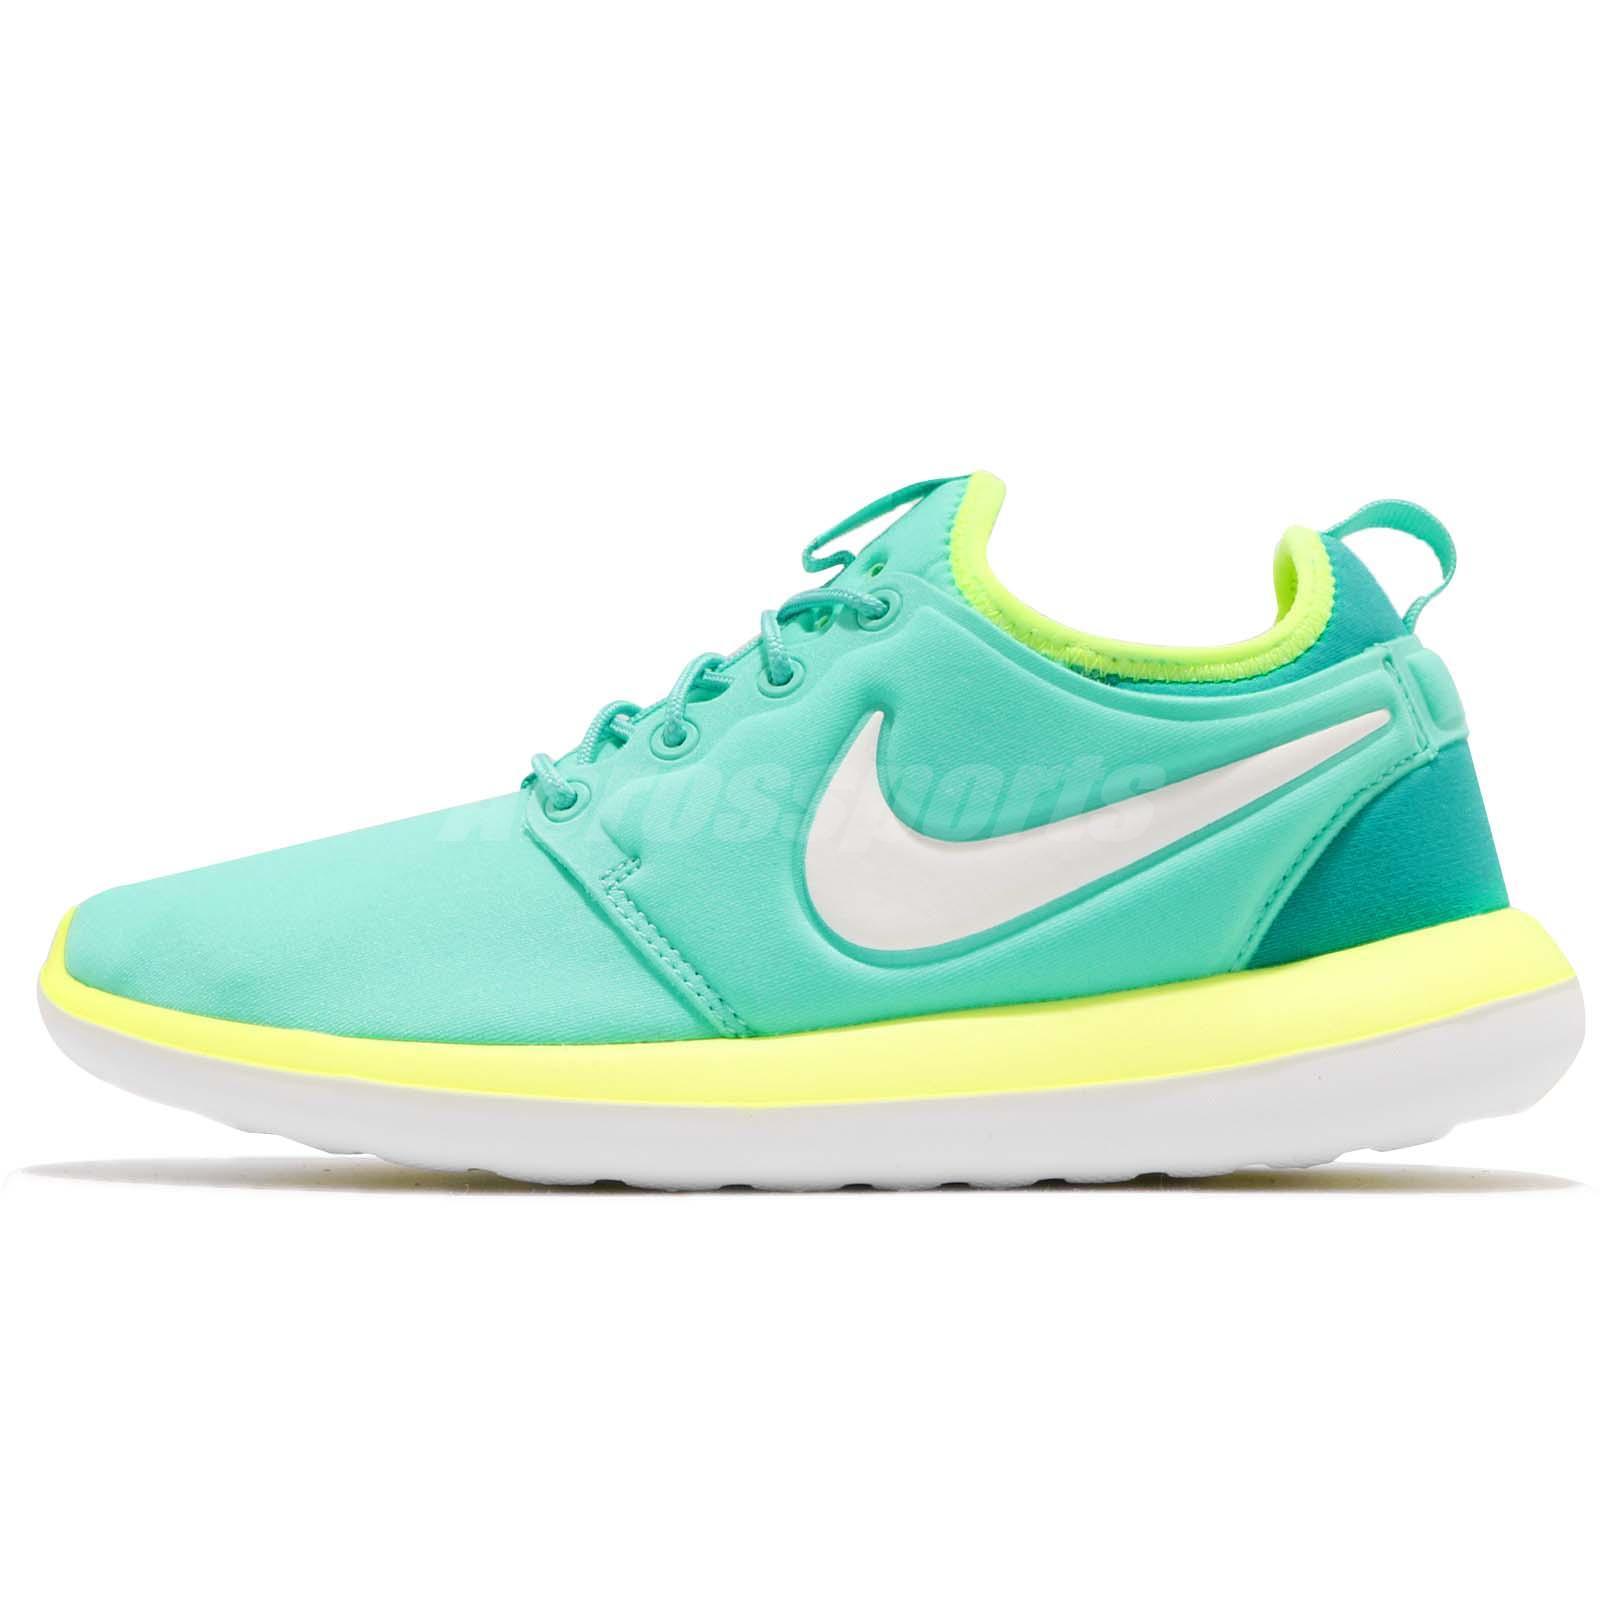 size 40 5f260 63563 Nike Roshe Two 2 GS Hyper Turquoise White Kids Girls Boys Women Shoes 844655 -300